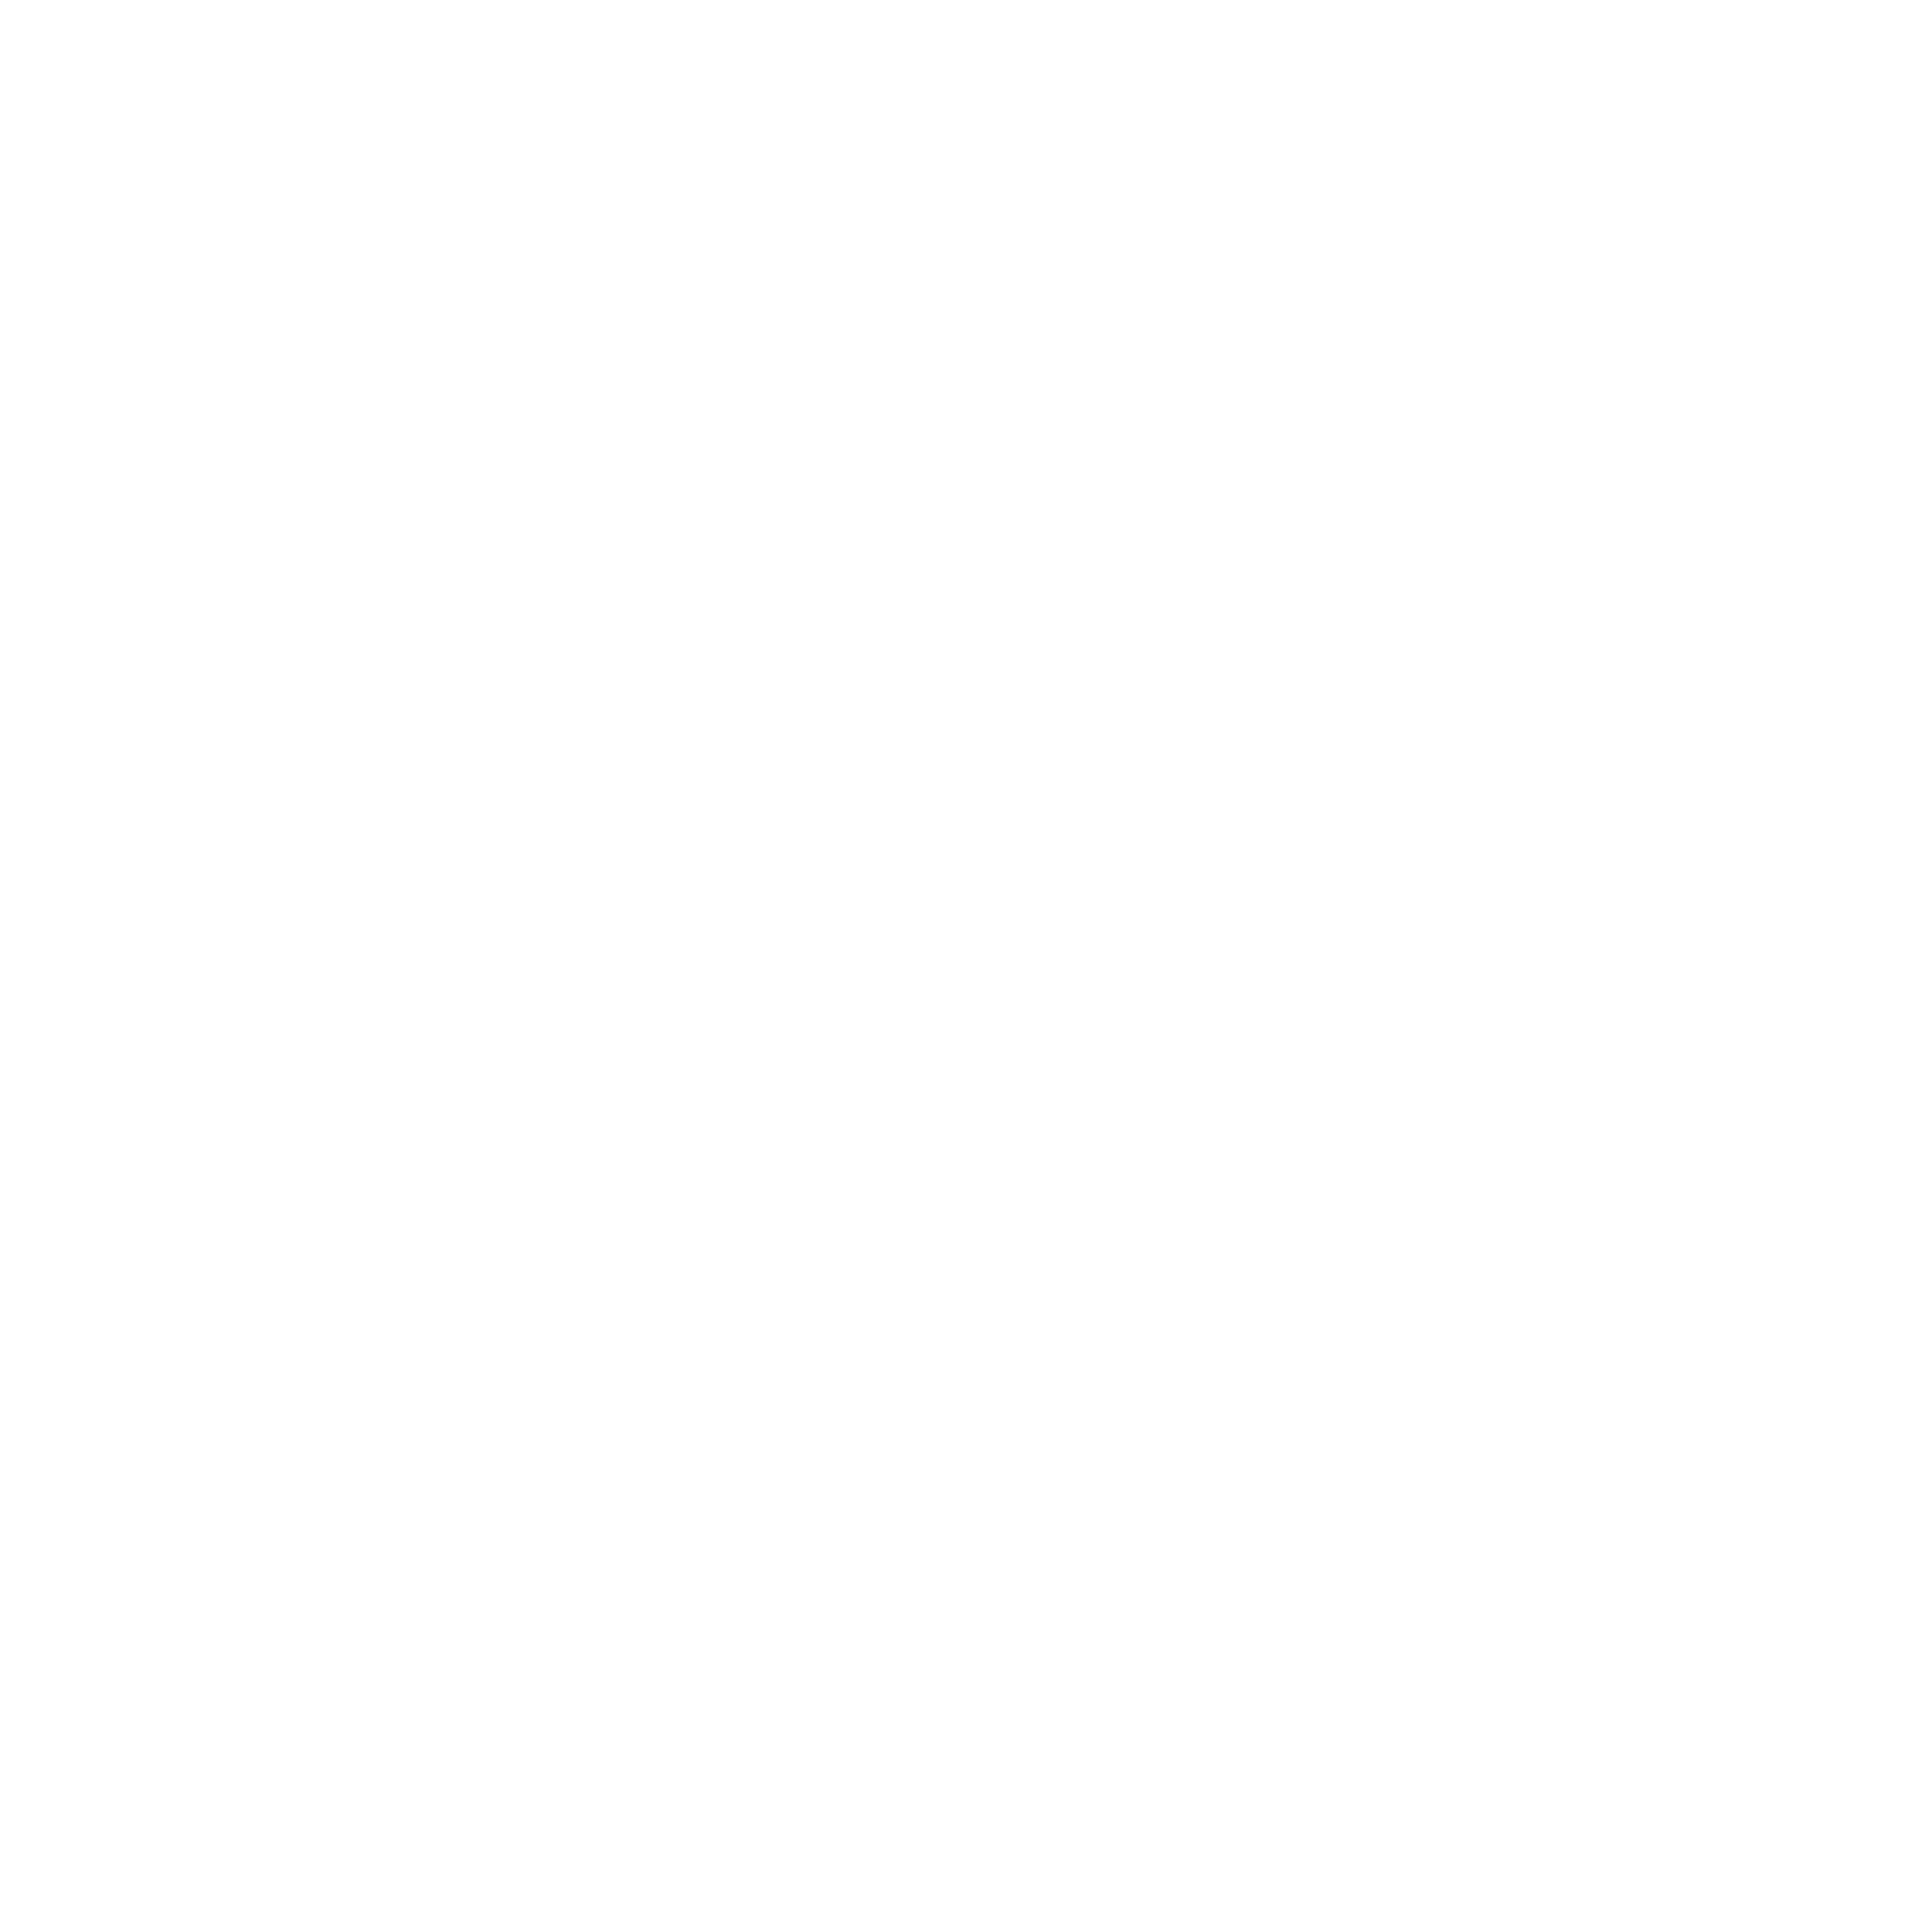 Сумка-шоппер OLDY «Tattoo girl», чёрный